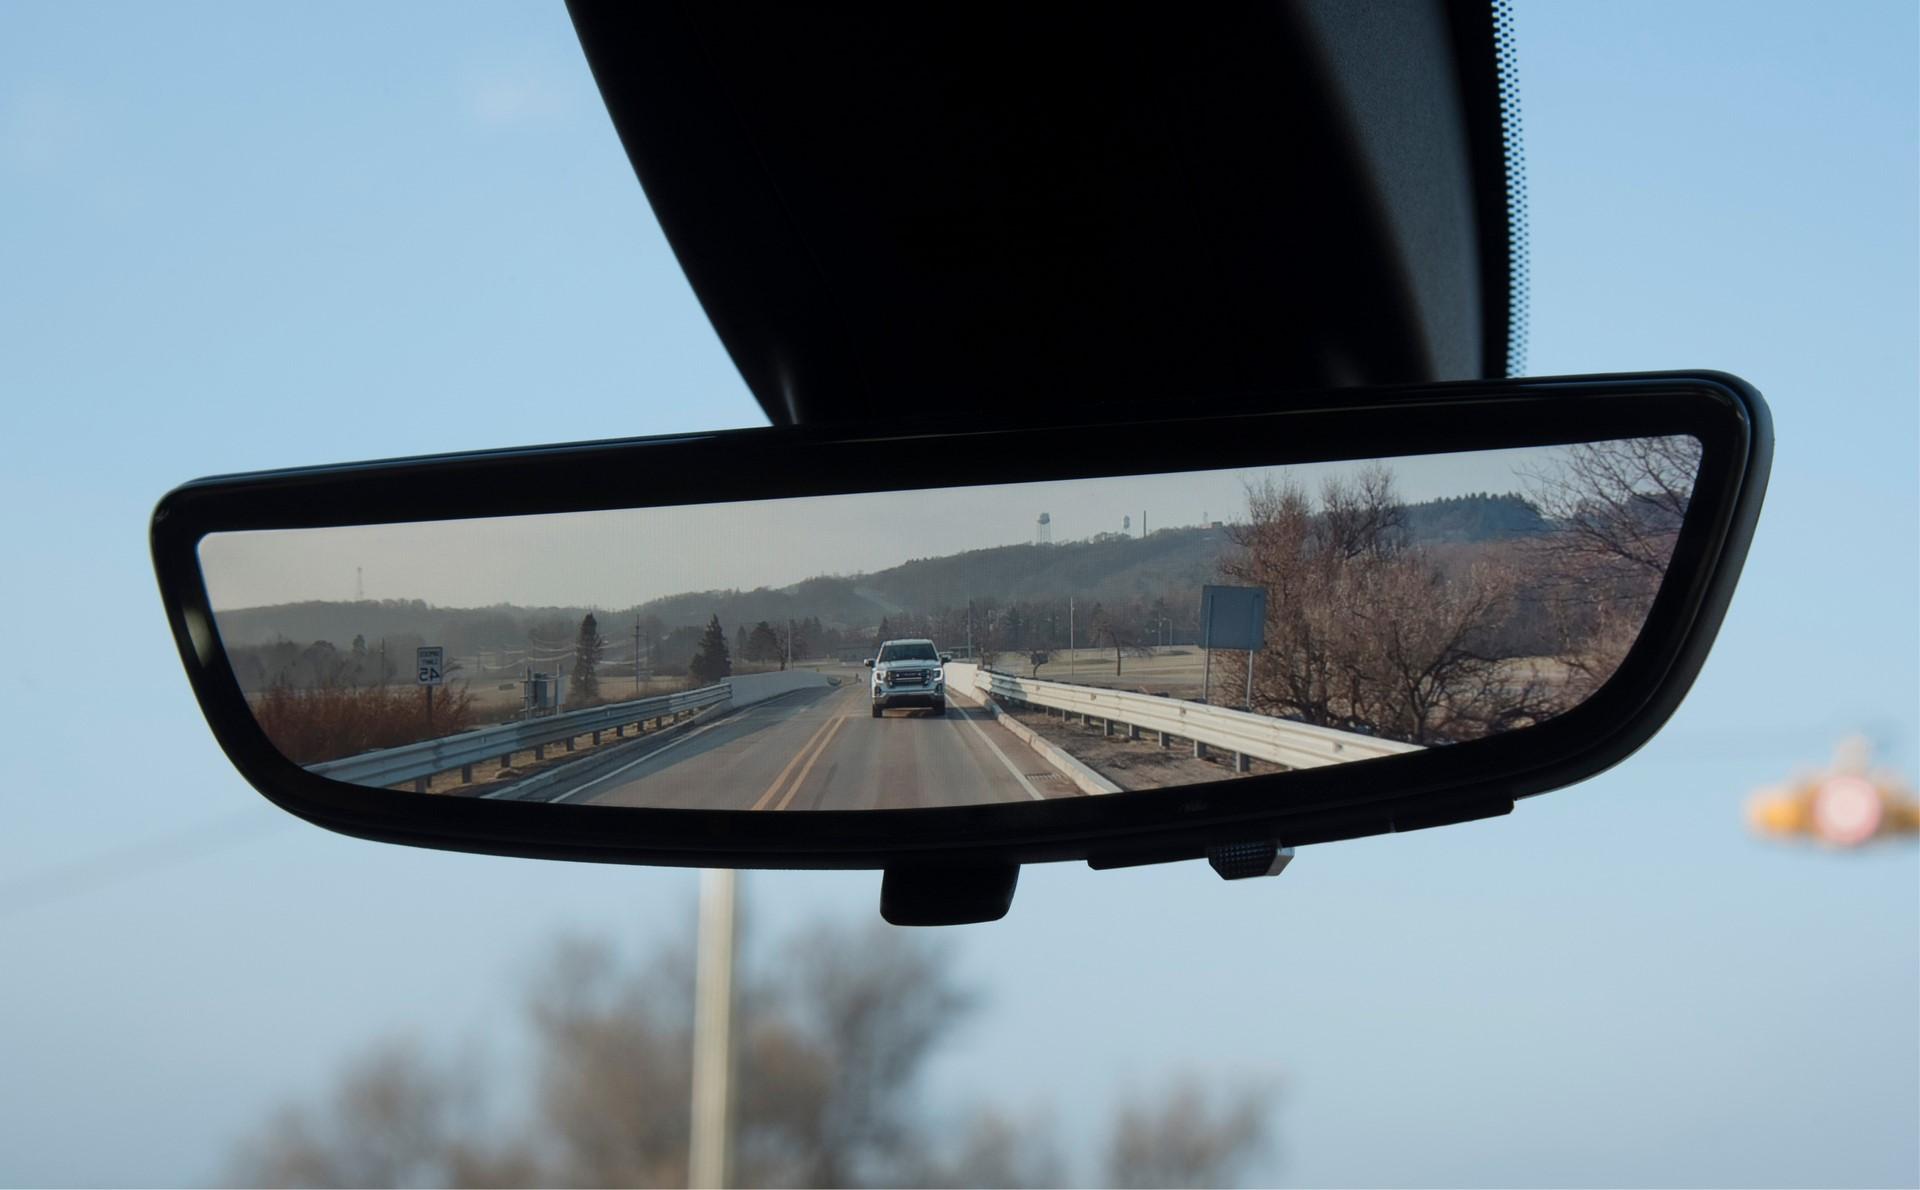 2020 GMC Sierra HD Rear View Mirror Camera